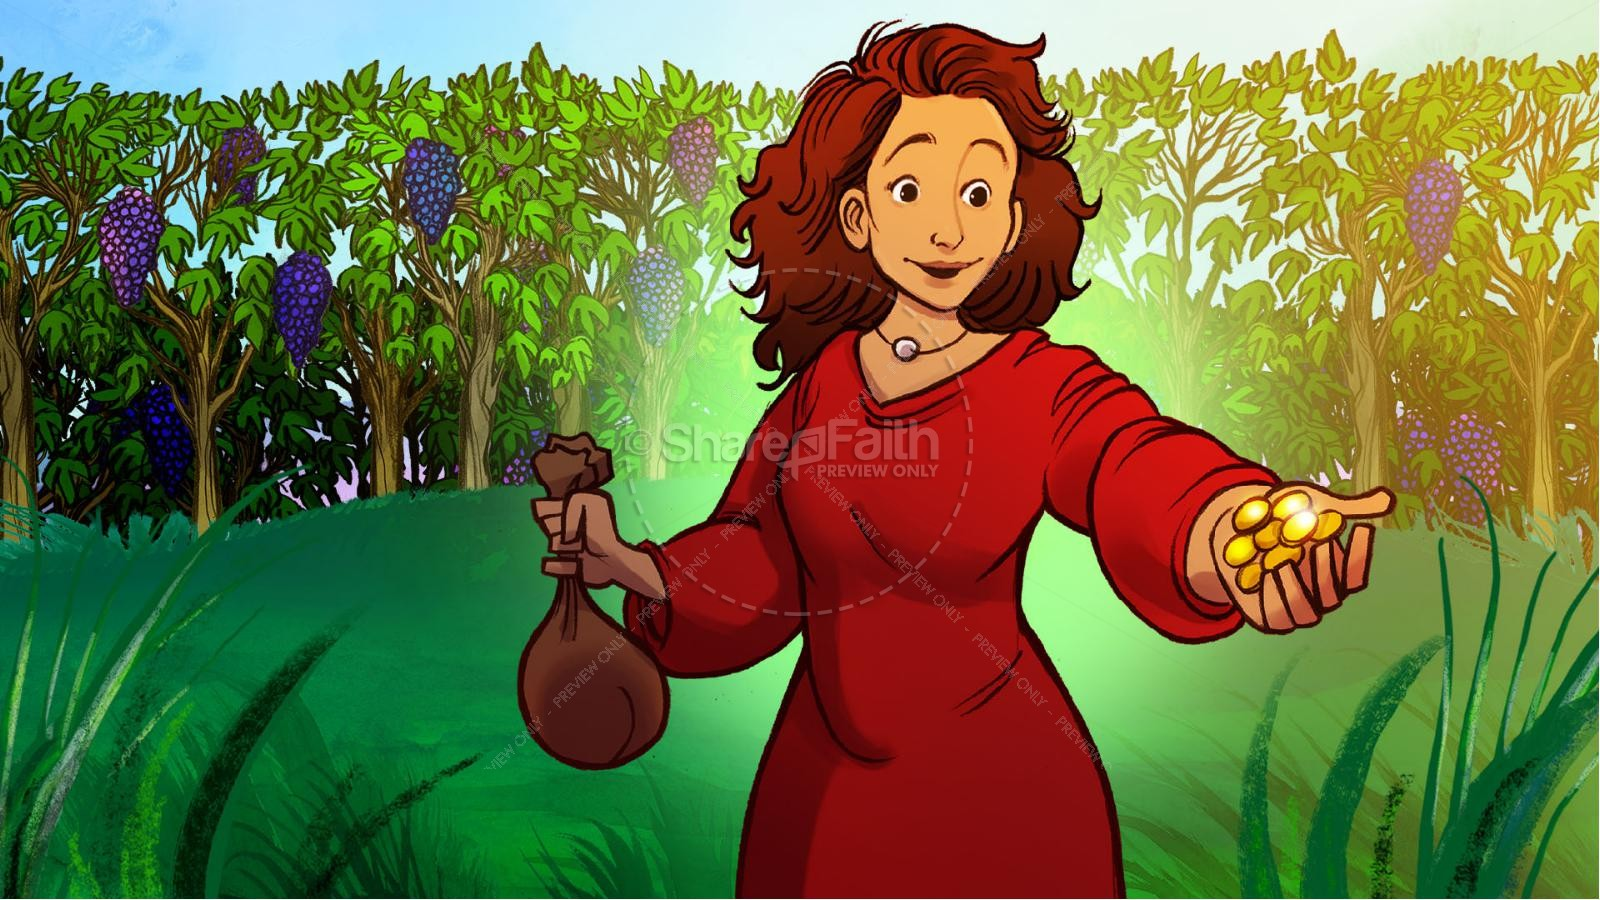 Proverbs 31 A Woman of Faith Kids Bible Story | slide 4